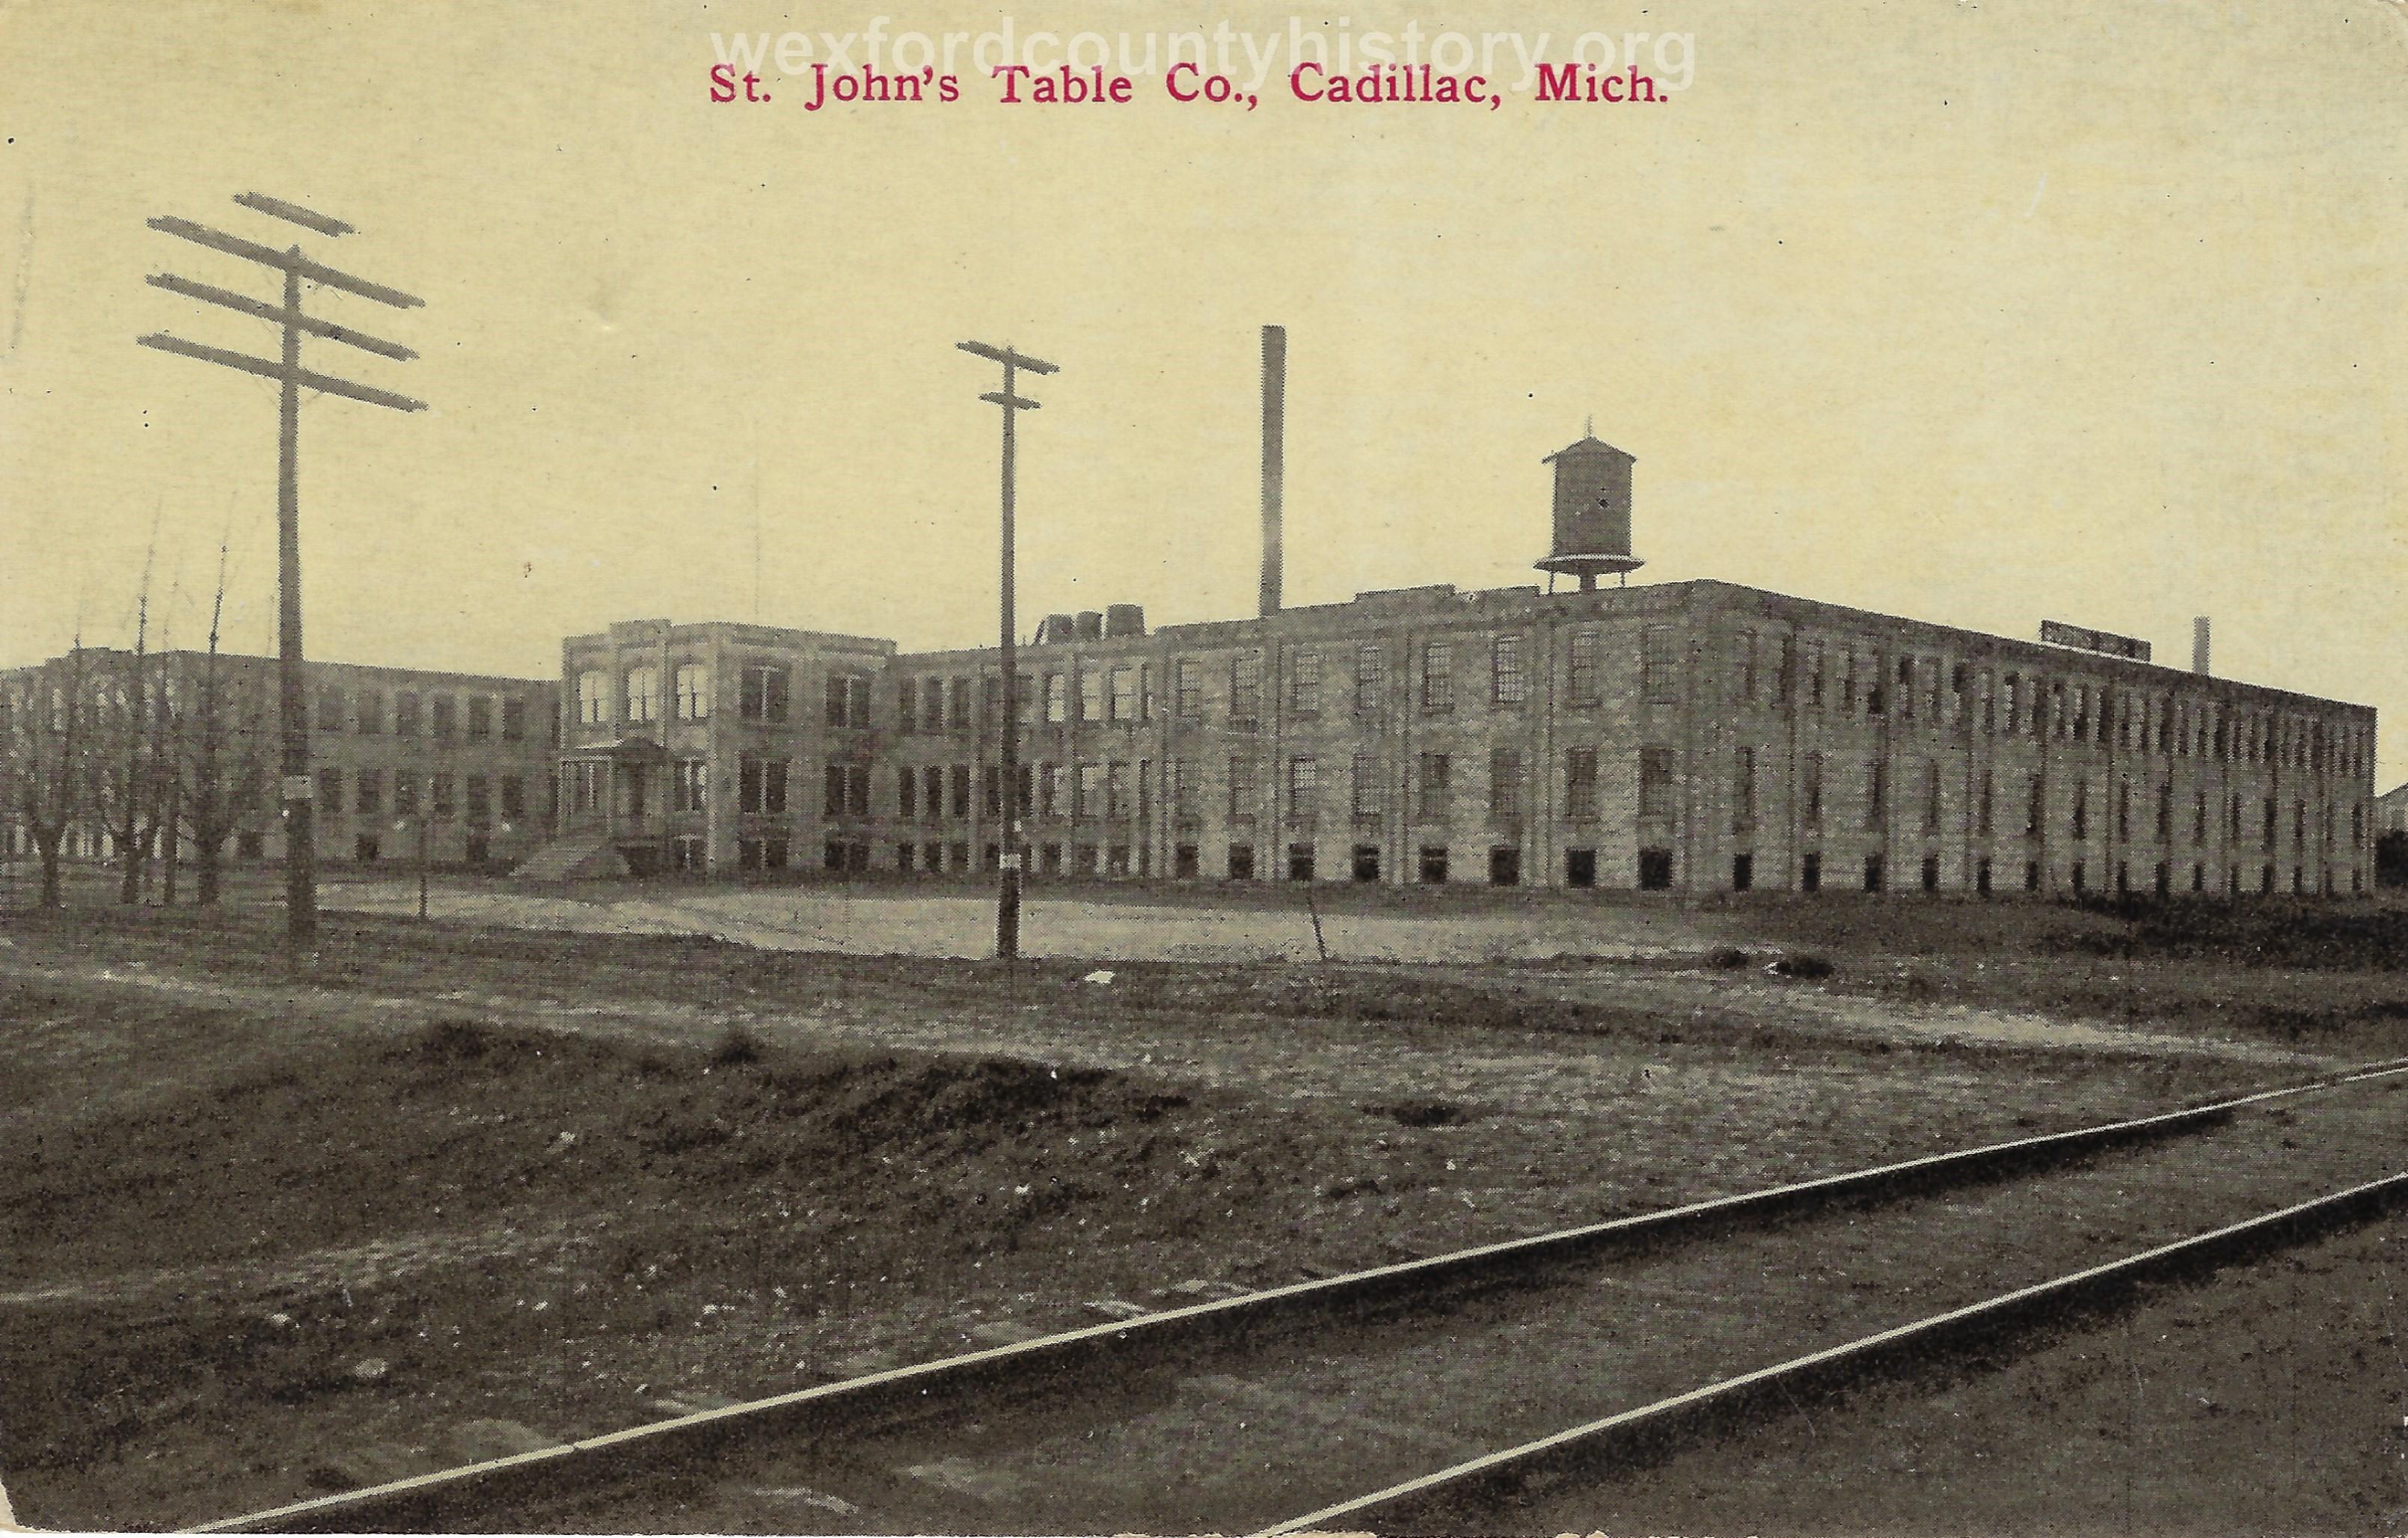 Cadillac-Business-Saint-Johns-Table-Factory-3